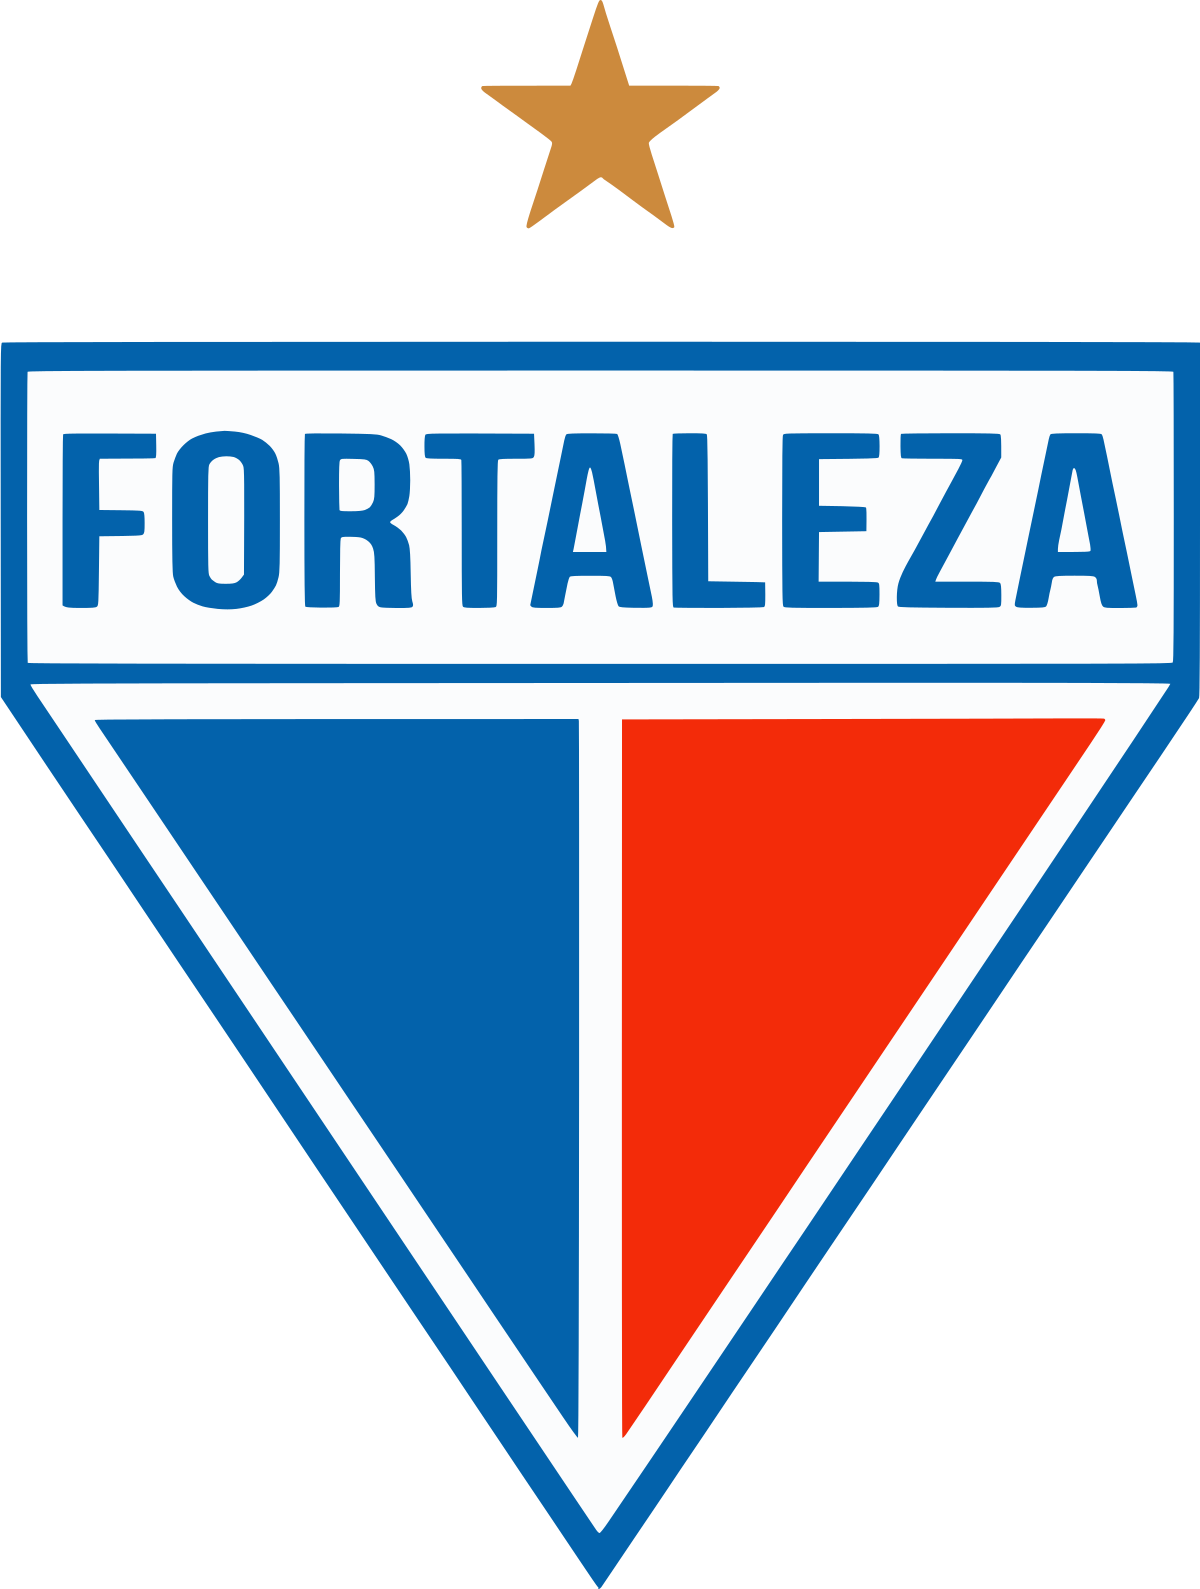 Fortaleza U-23 logo